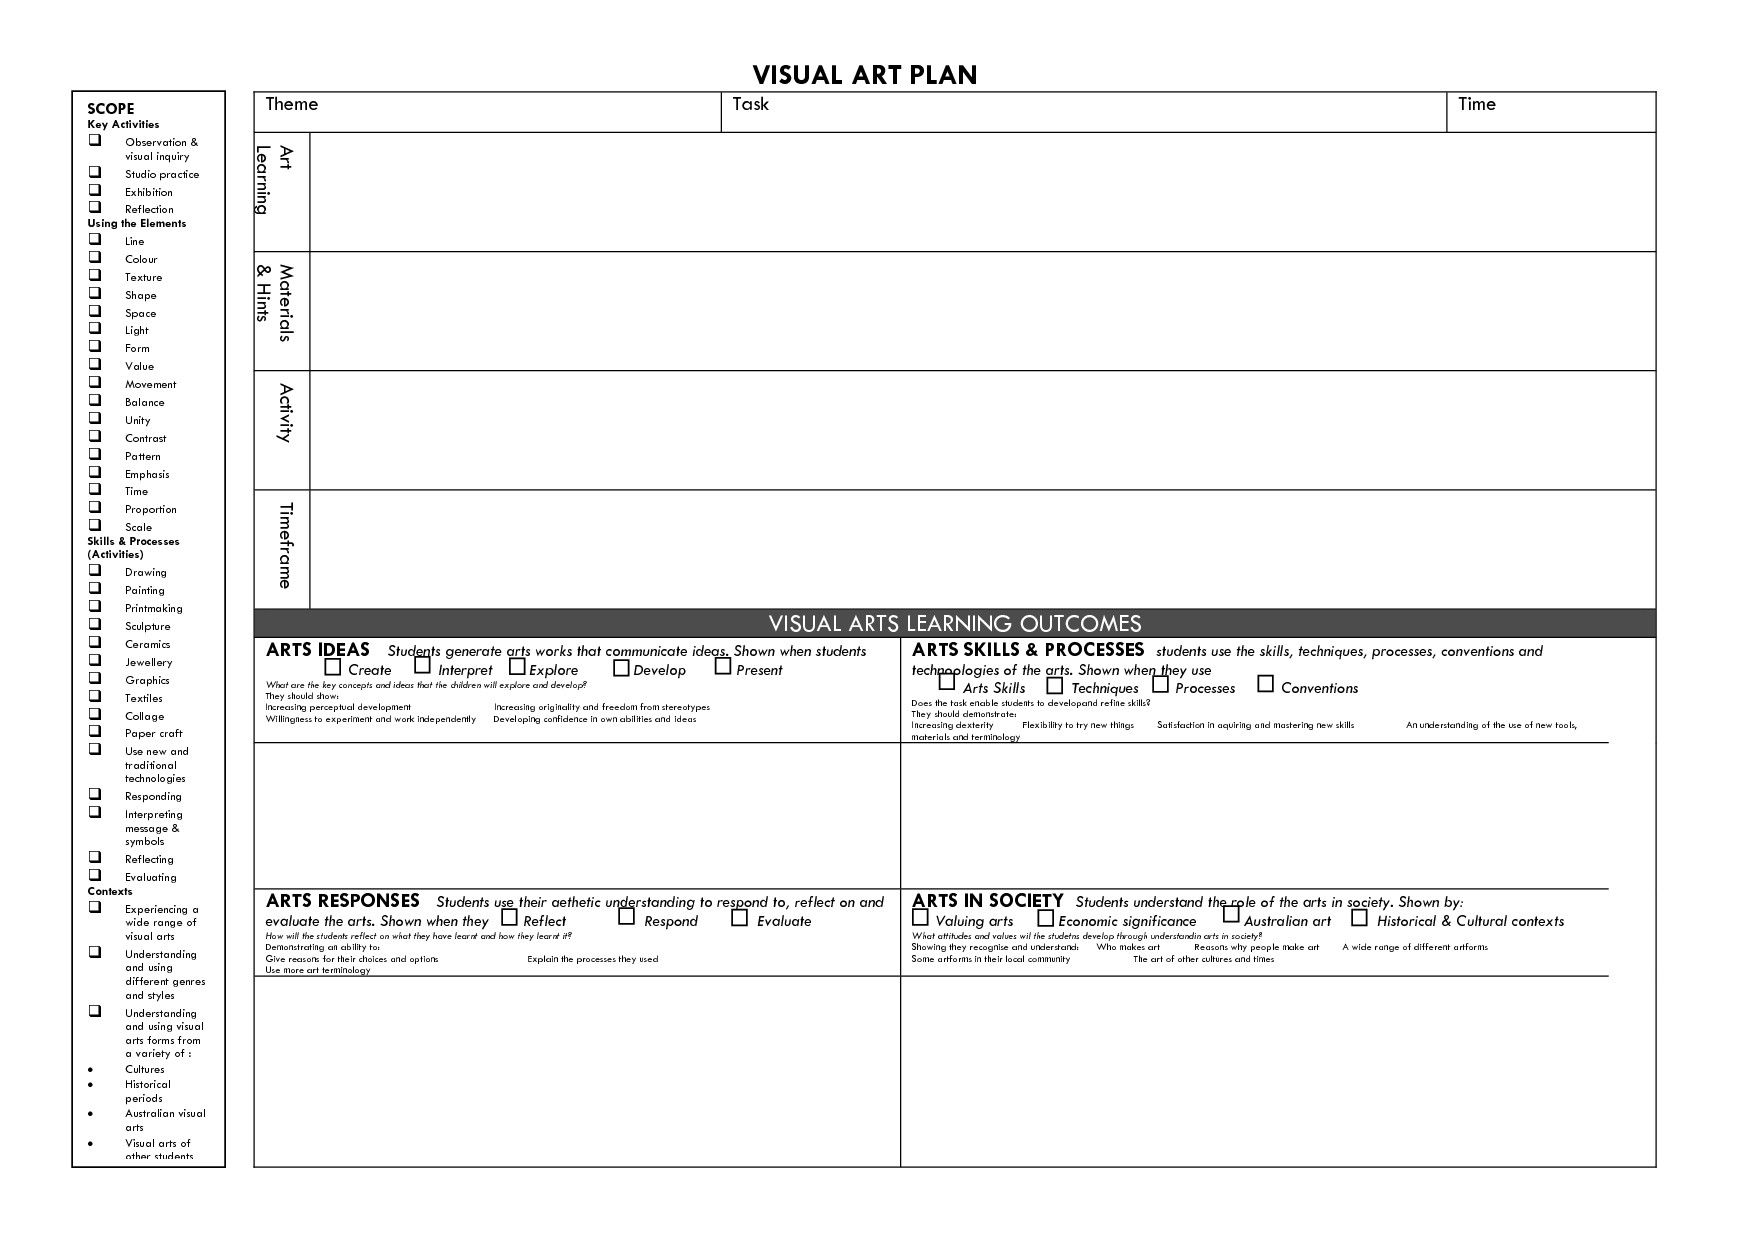 Visual Art Lesson Plan Template Luxury Visual Arts Lesson Plan Template Visual Art Language Arts Lesson Plans Lesson Plan Templates Elementary Art Lesson Plans Elementary art lesson plan template